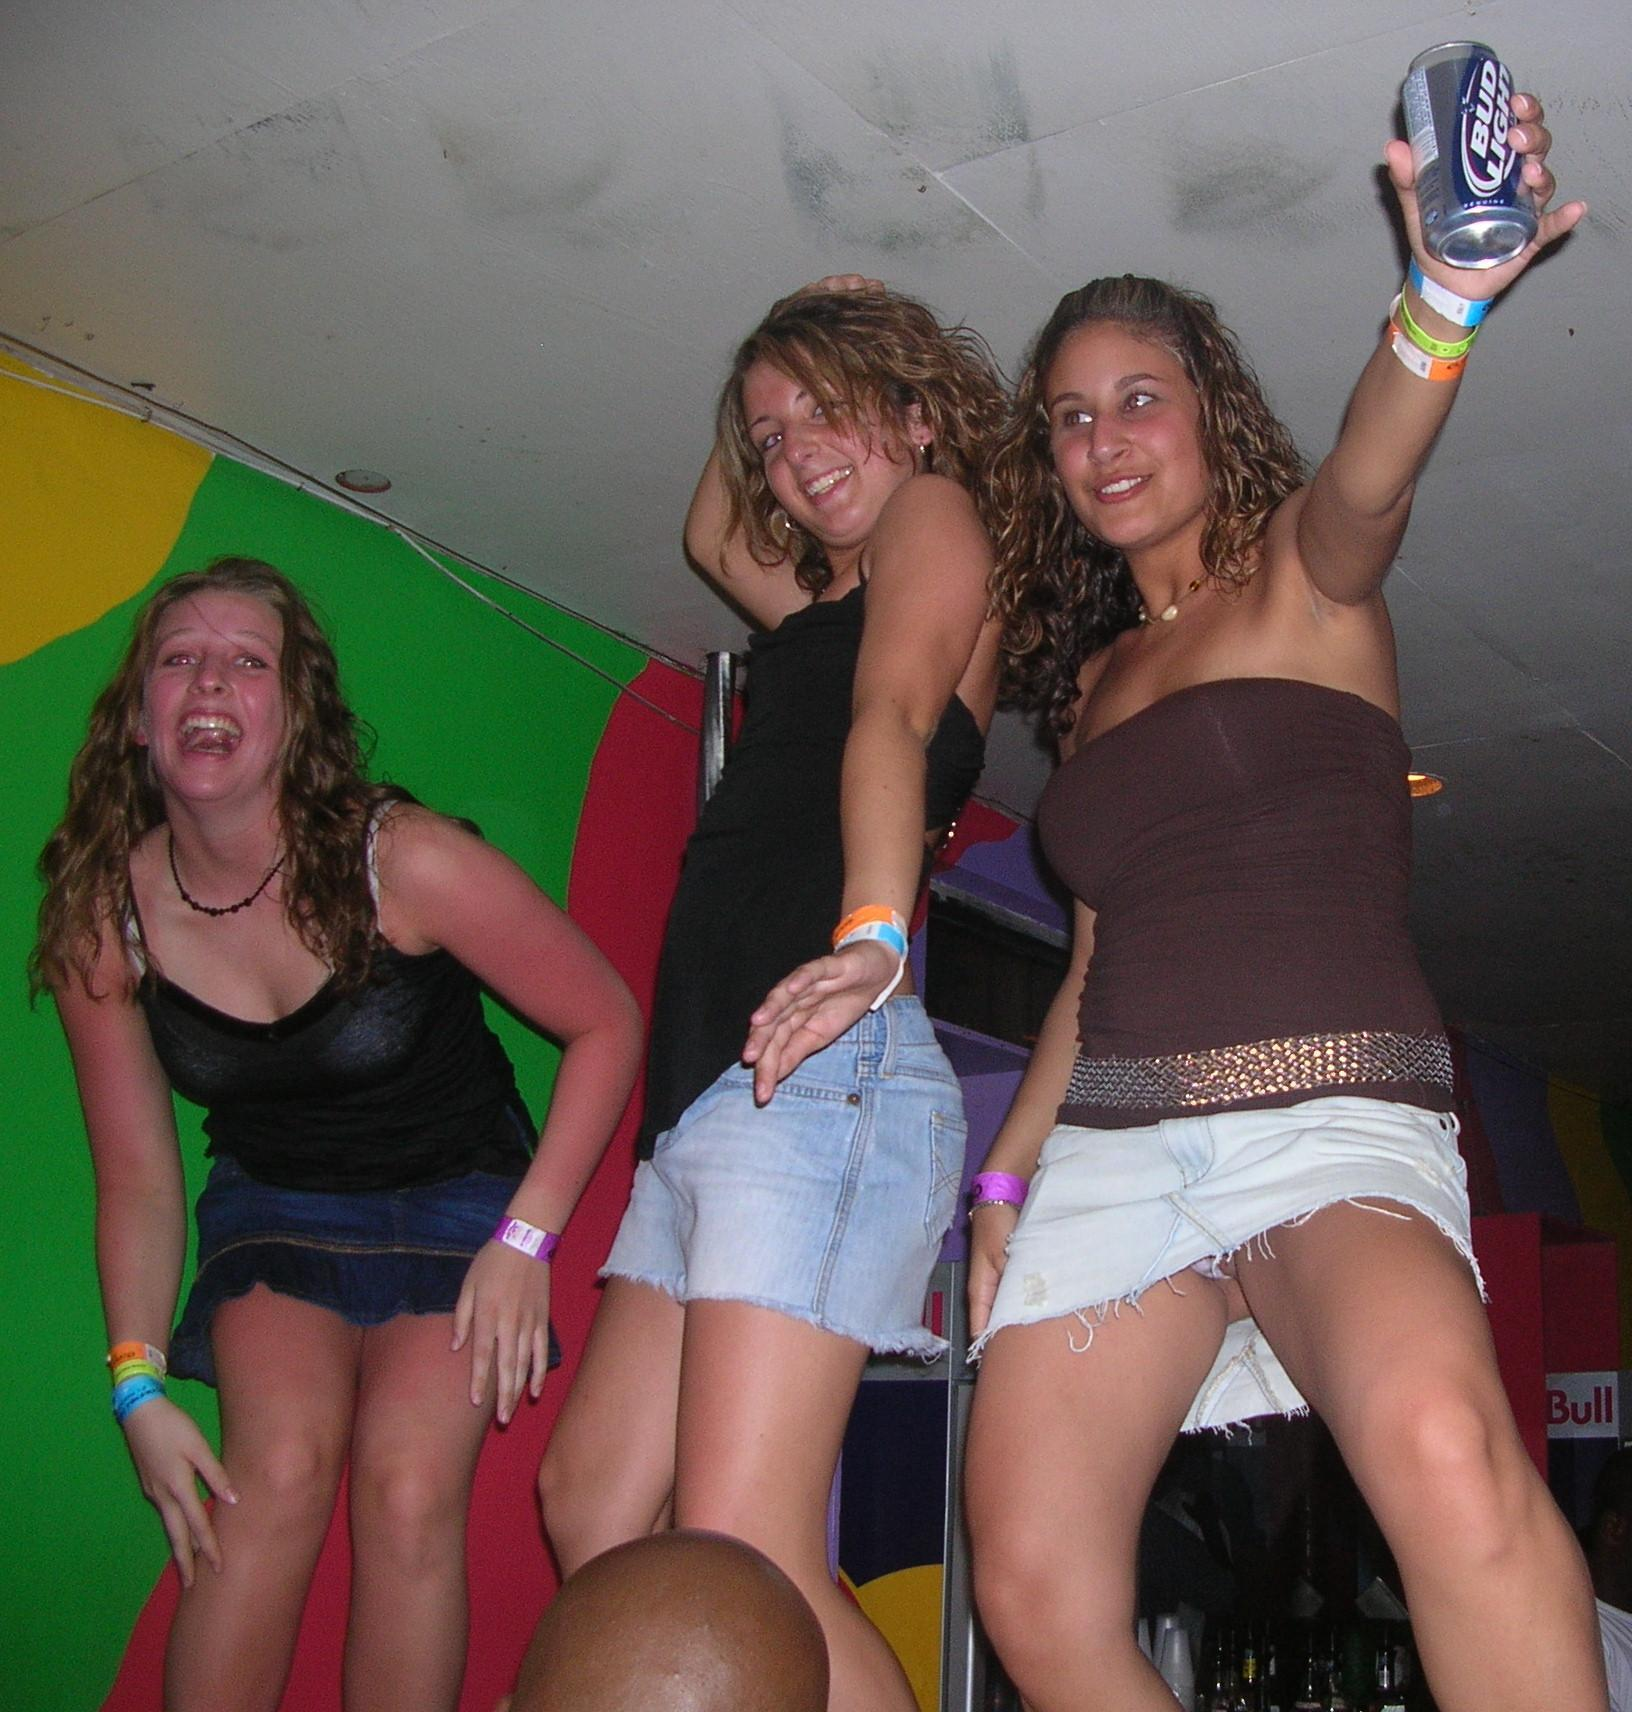 Drunk club girls upskirt